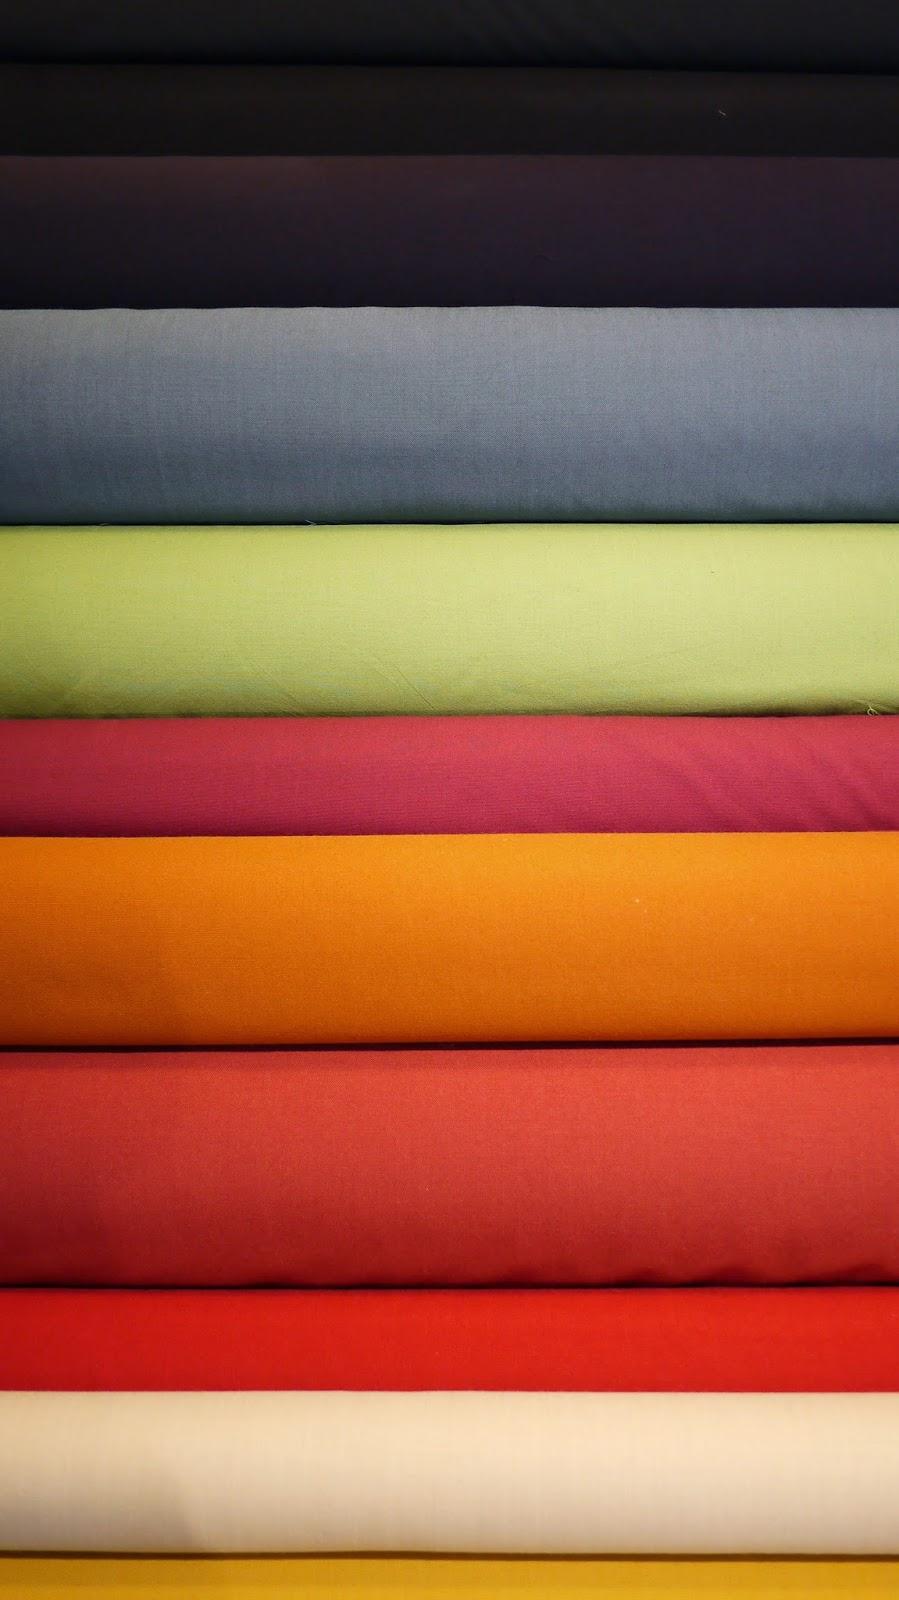 "Bestla"" fra Fanny Aronson/Kvadrat. 68% ny uld 26% bomuld 6% polyamid. ""Bestla"" er 140cm. bred og koster 298 kr. pr meter."